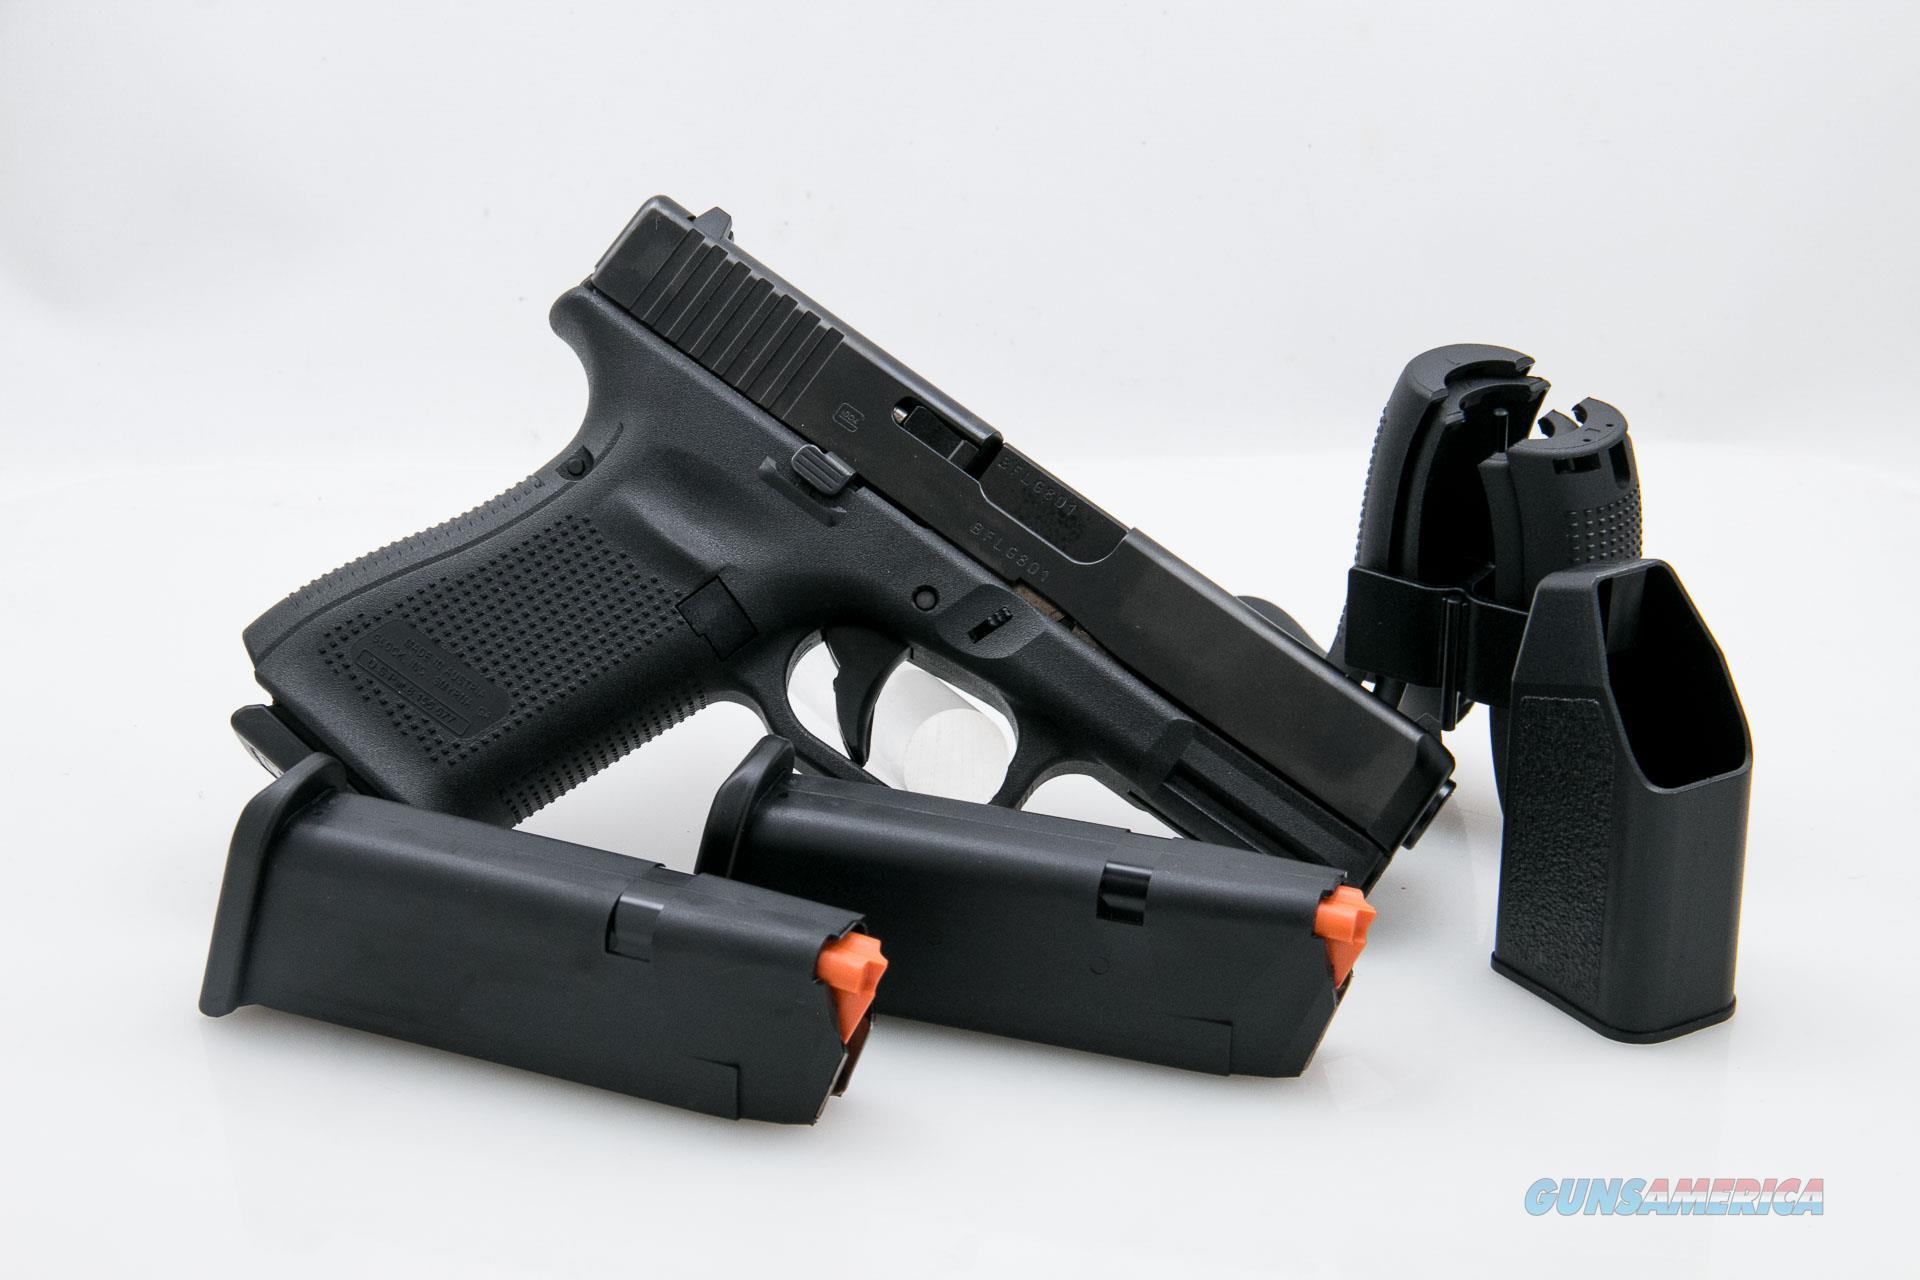 Glock 19 Generation 5 9mm NEW Three Magazines  Guns > Pistols > Glock Pistols > 19